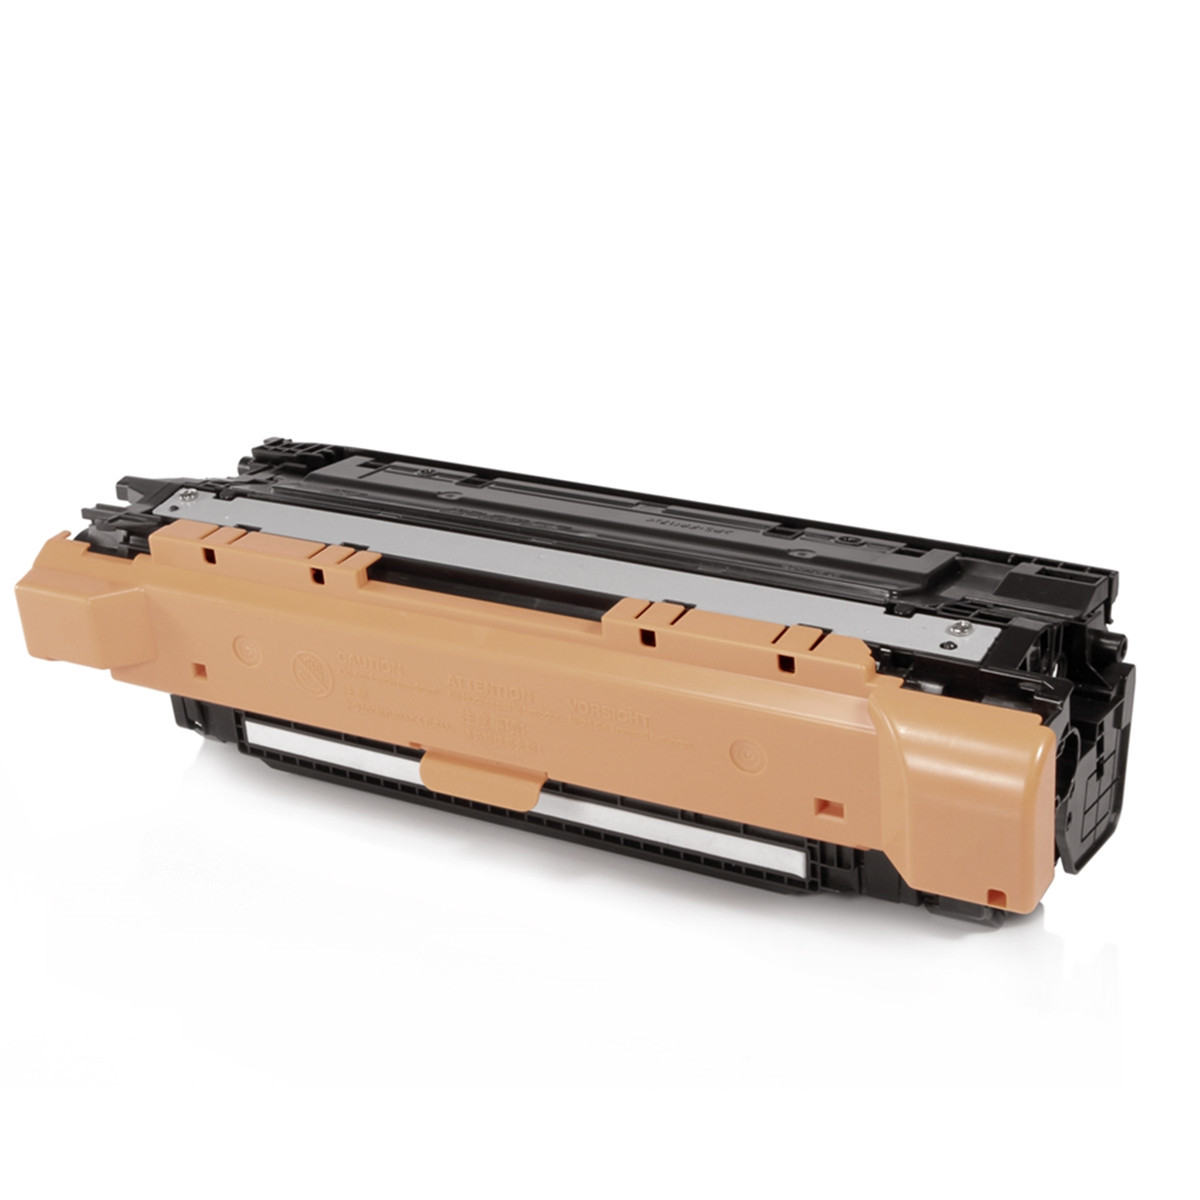 Toner Compatível com HP CE250X Preto | CP3525 CM3530 CP3525DN CP3525N CP3525X | Importado 11k